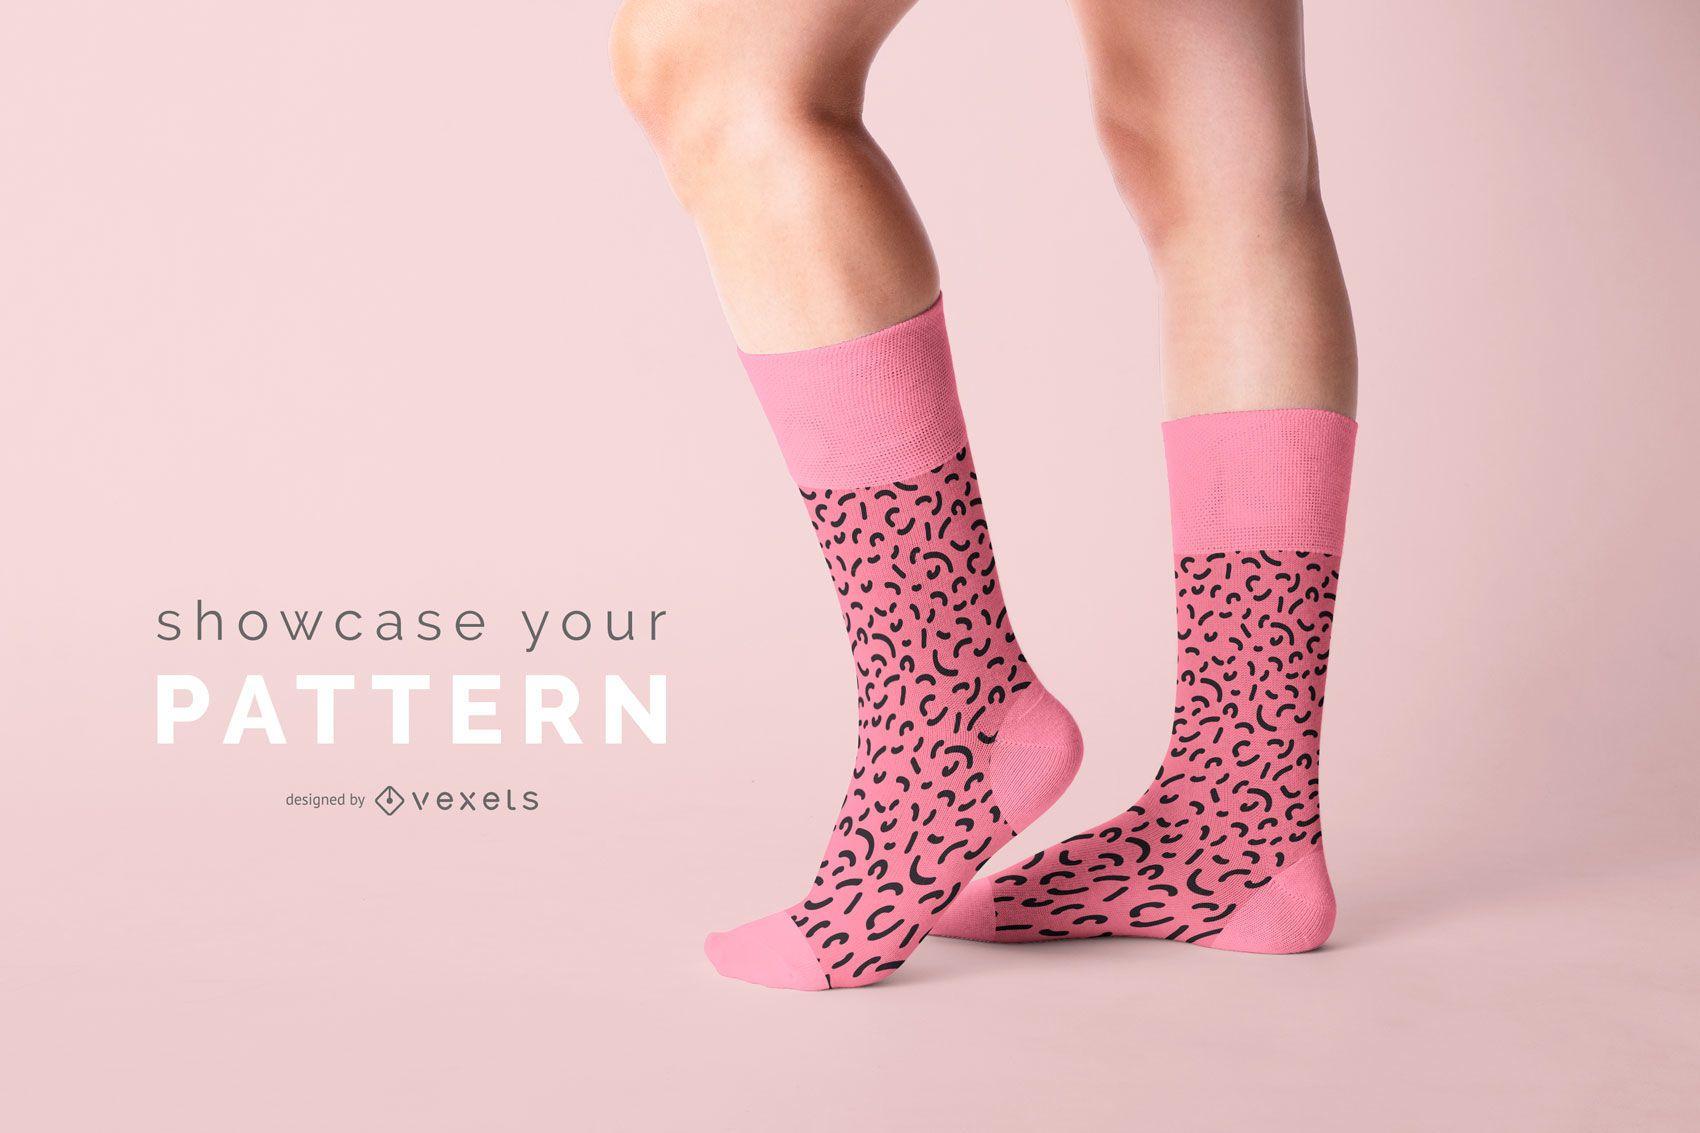 Pattern Socks Merch Mockup